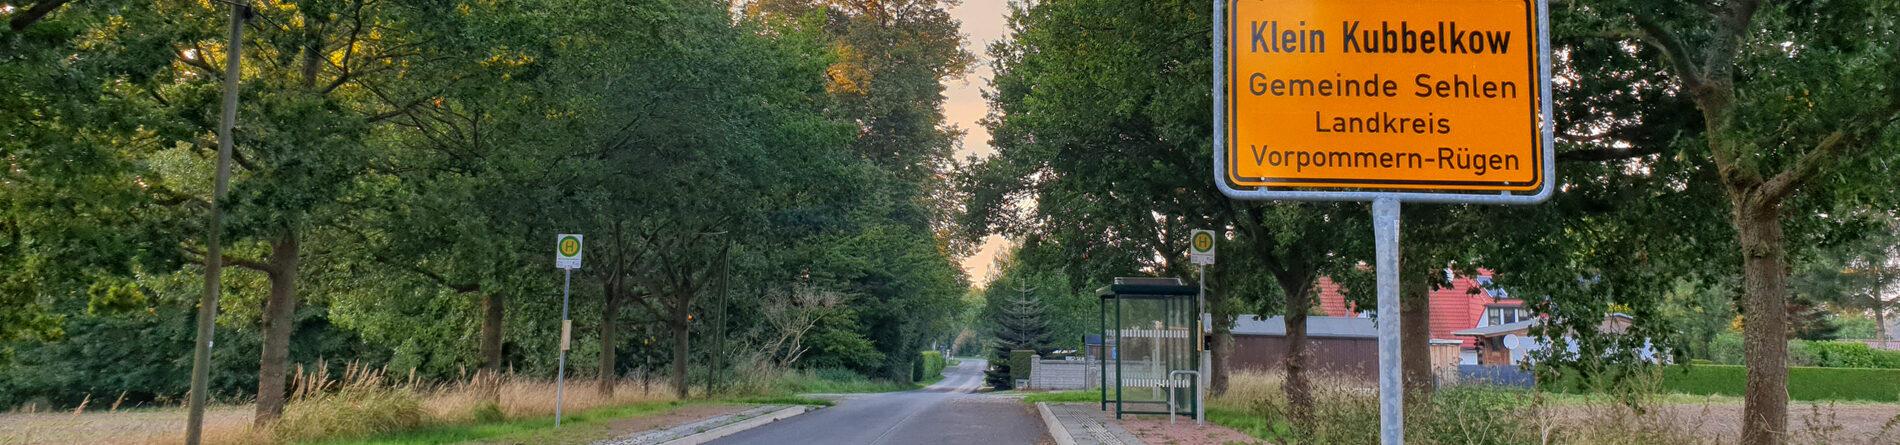 Ortseingang Klein Kubbelkow